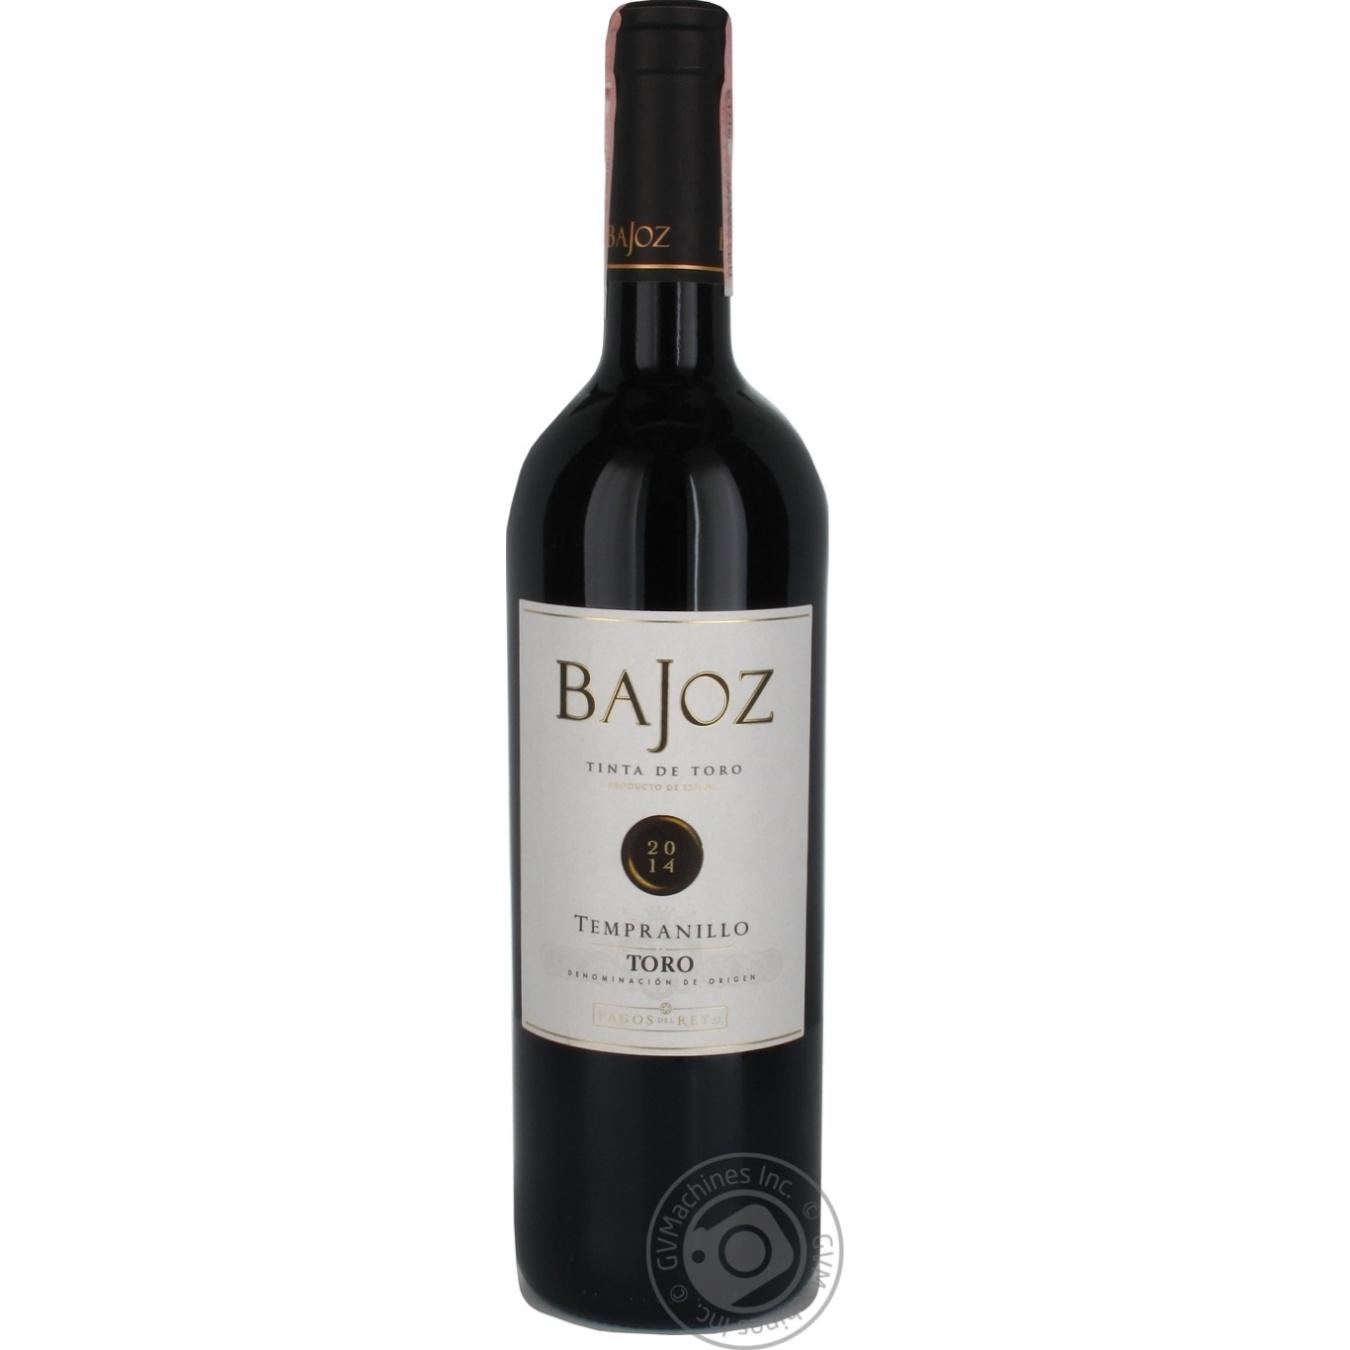 Купить Алкоголь та енергетики, Вино Bajoz Tempranillo Toro червоне сухе 13, 5% 0, 75л